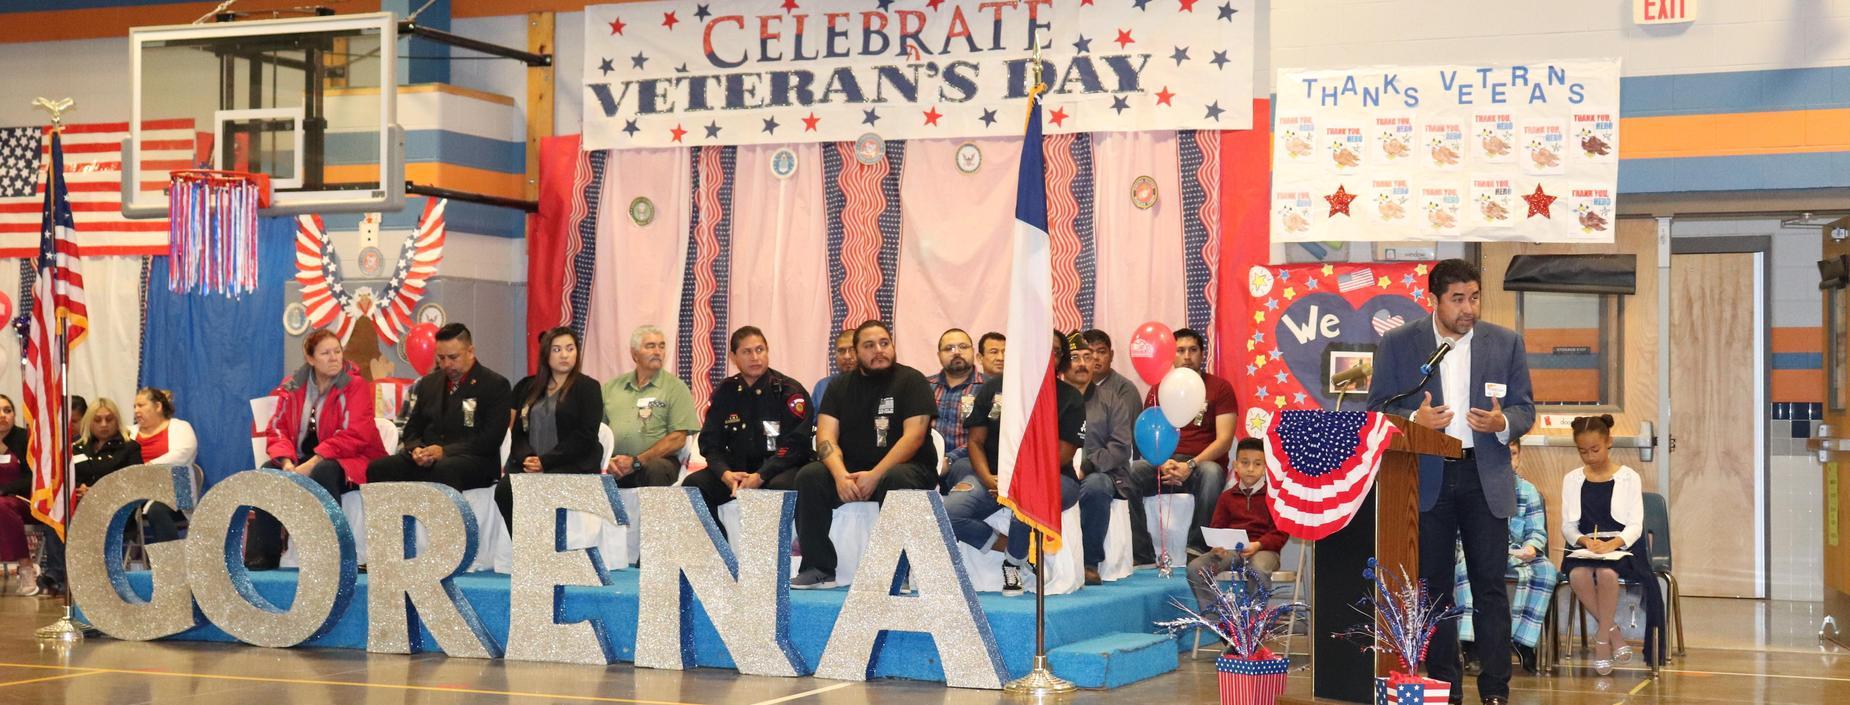 picture of Veteran's program